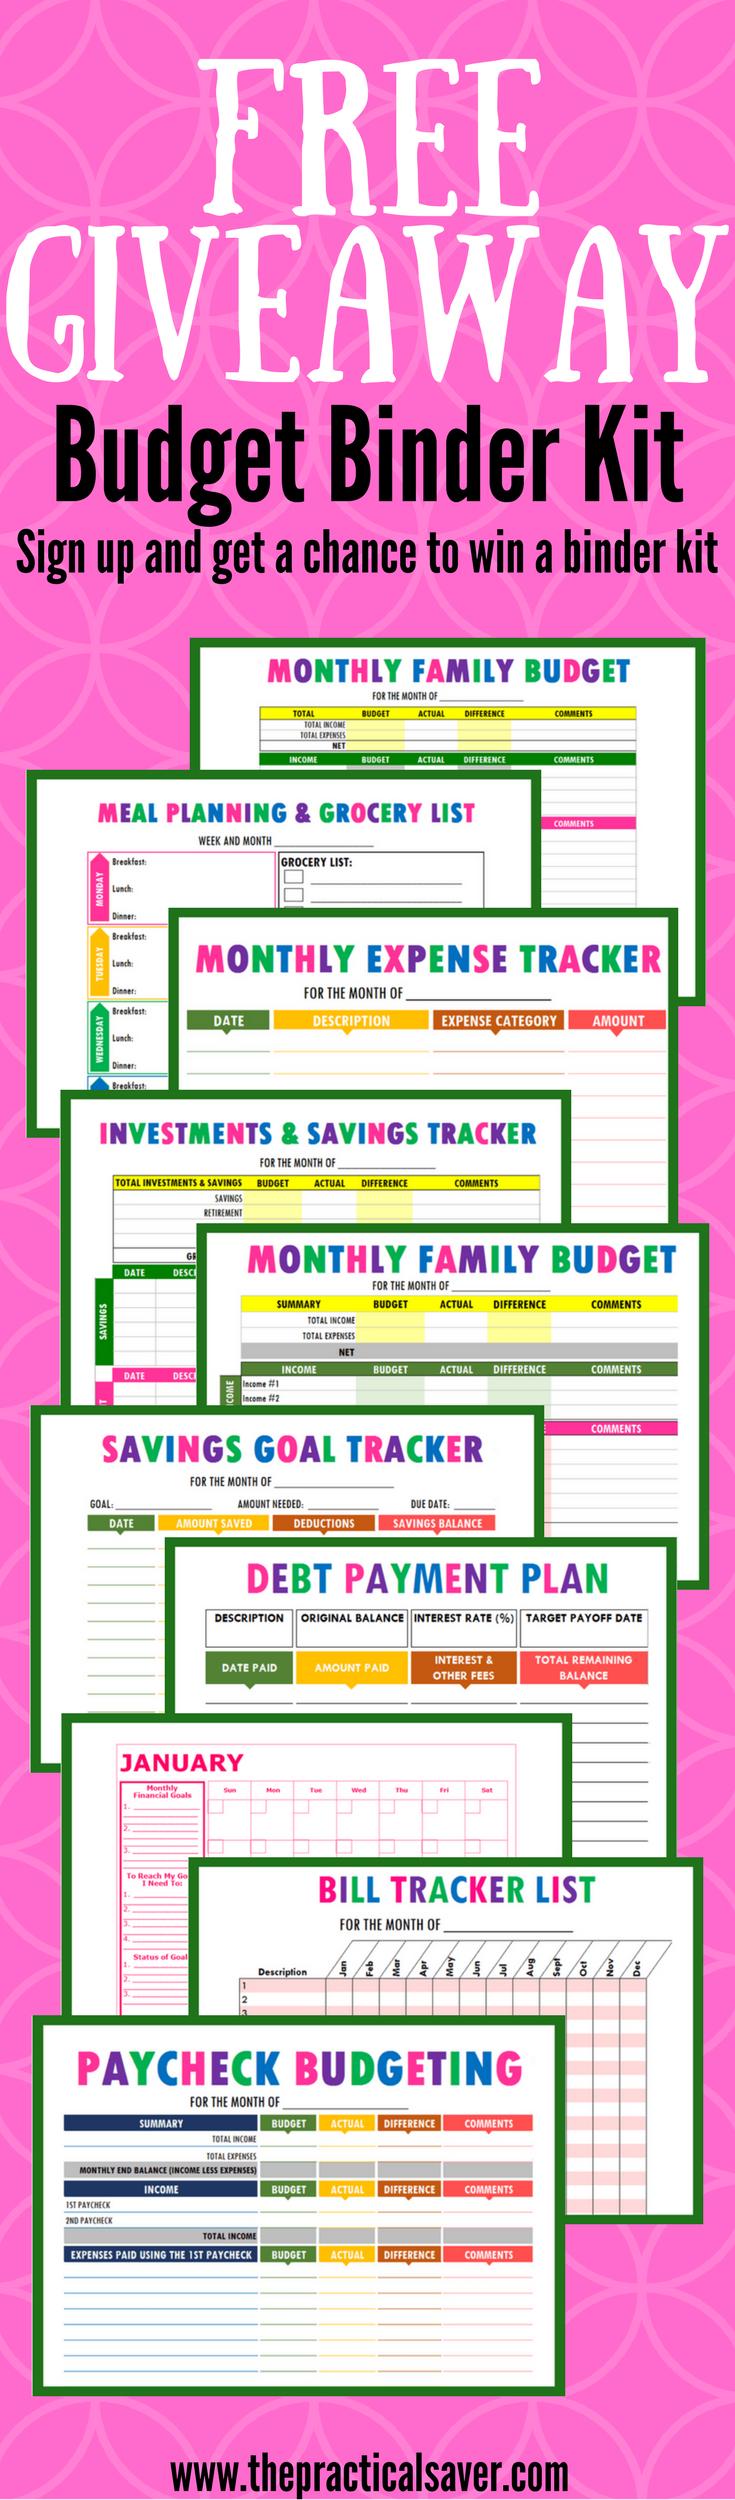 budget binder printables budget calculator loan calculator and